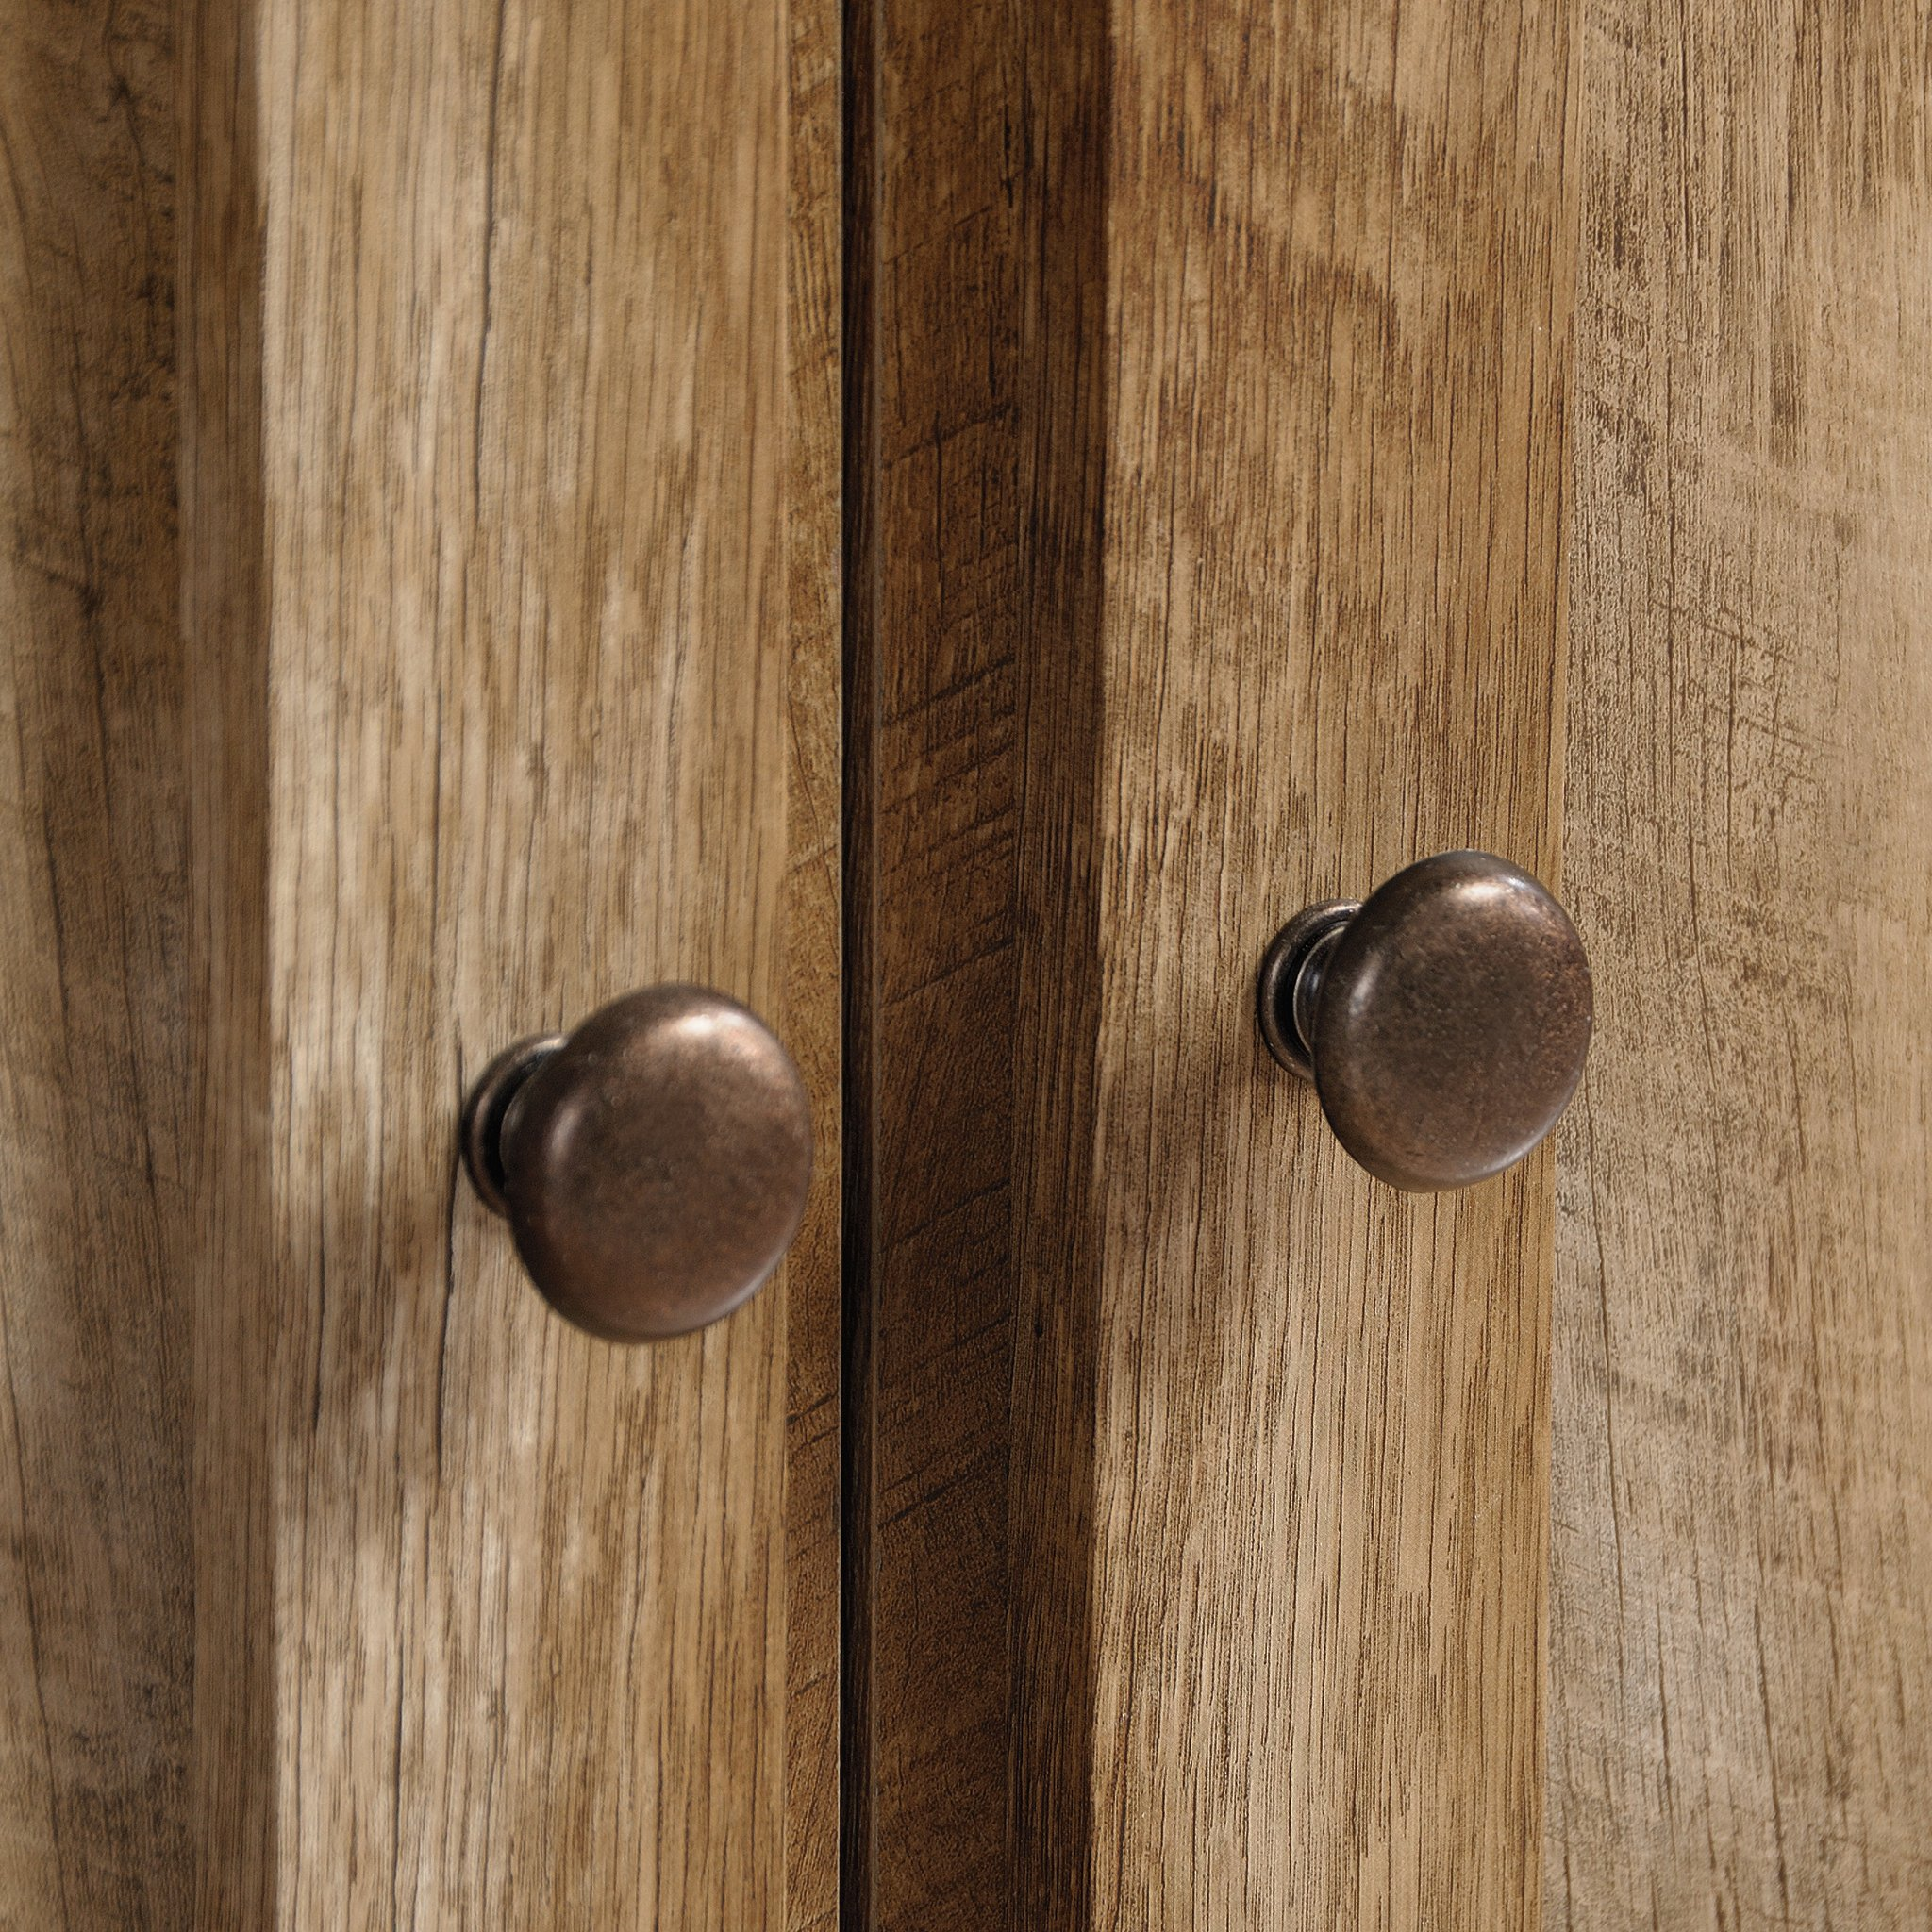 Sauder 420409 Dakota Pass Library with Doors, L: 33.82'' x W: 12.52'' x H: 71.10'', Craftsman Oak Finish by Sauder (Image #8)